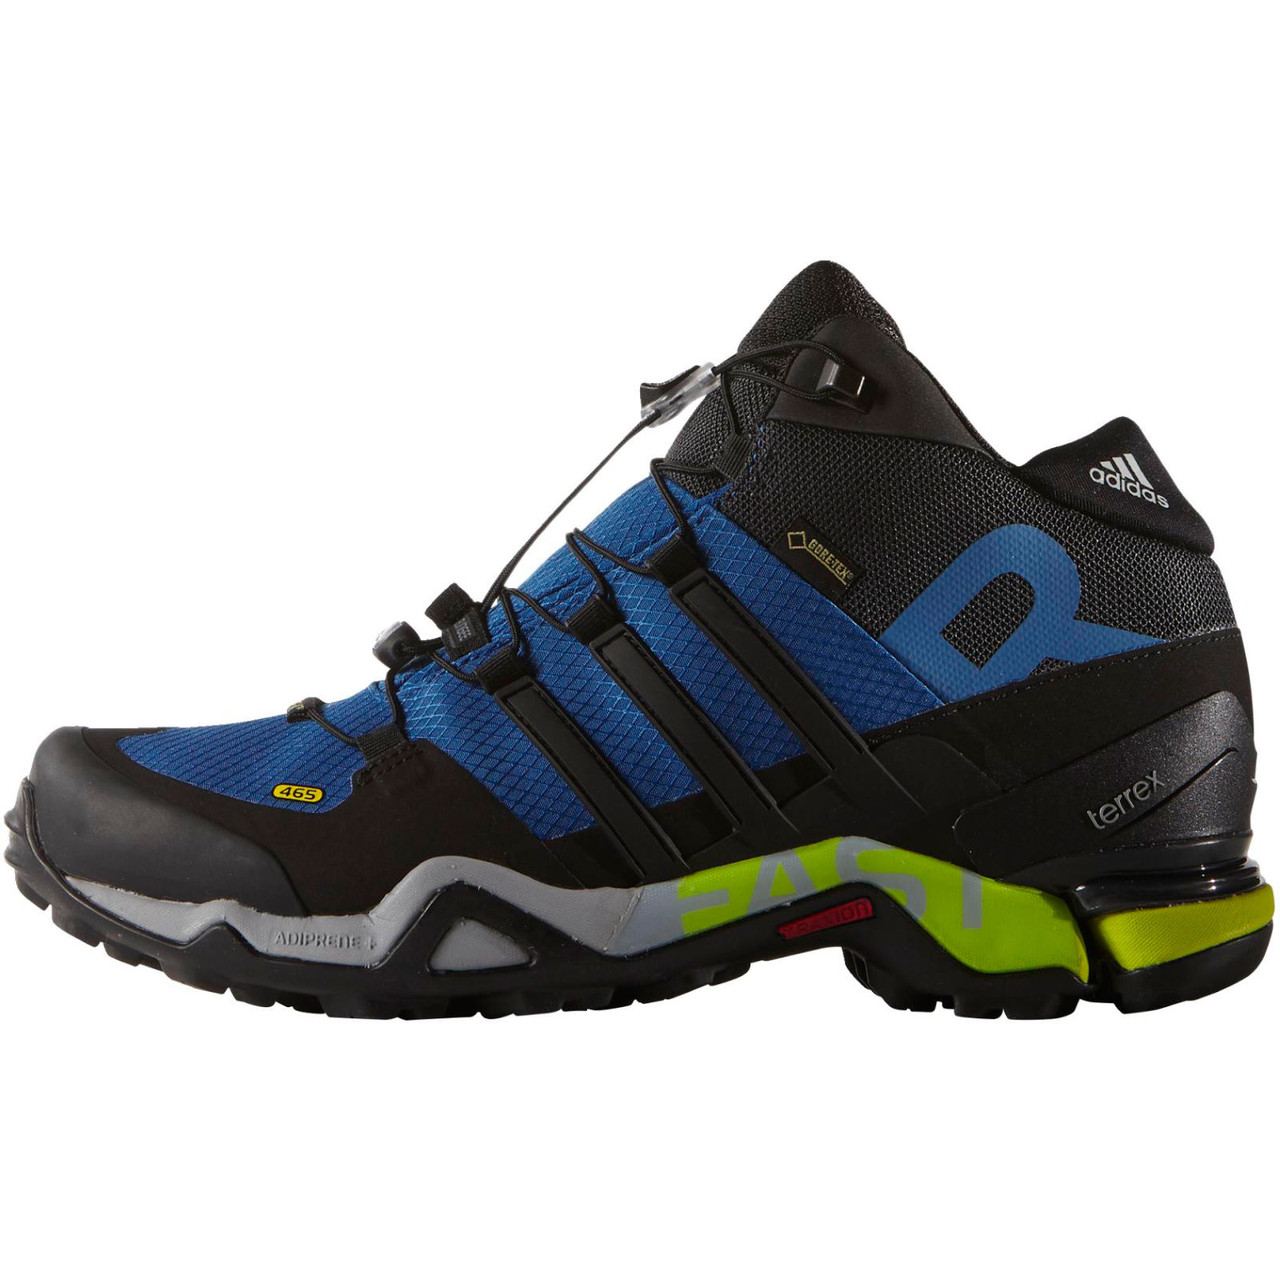 Adidas Terrex Fast R Mid GTX Shoes (SS16) - картинка 1